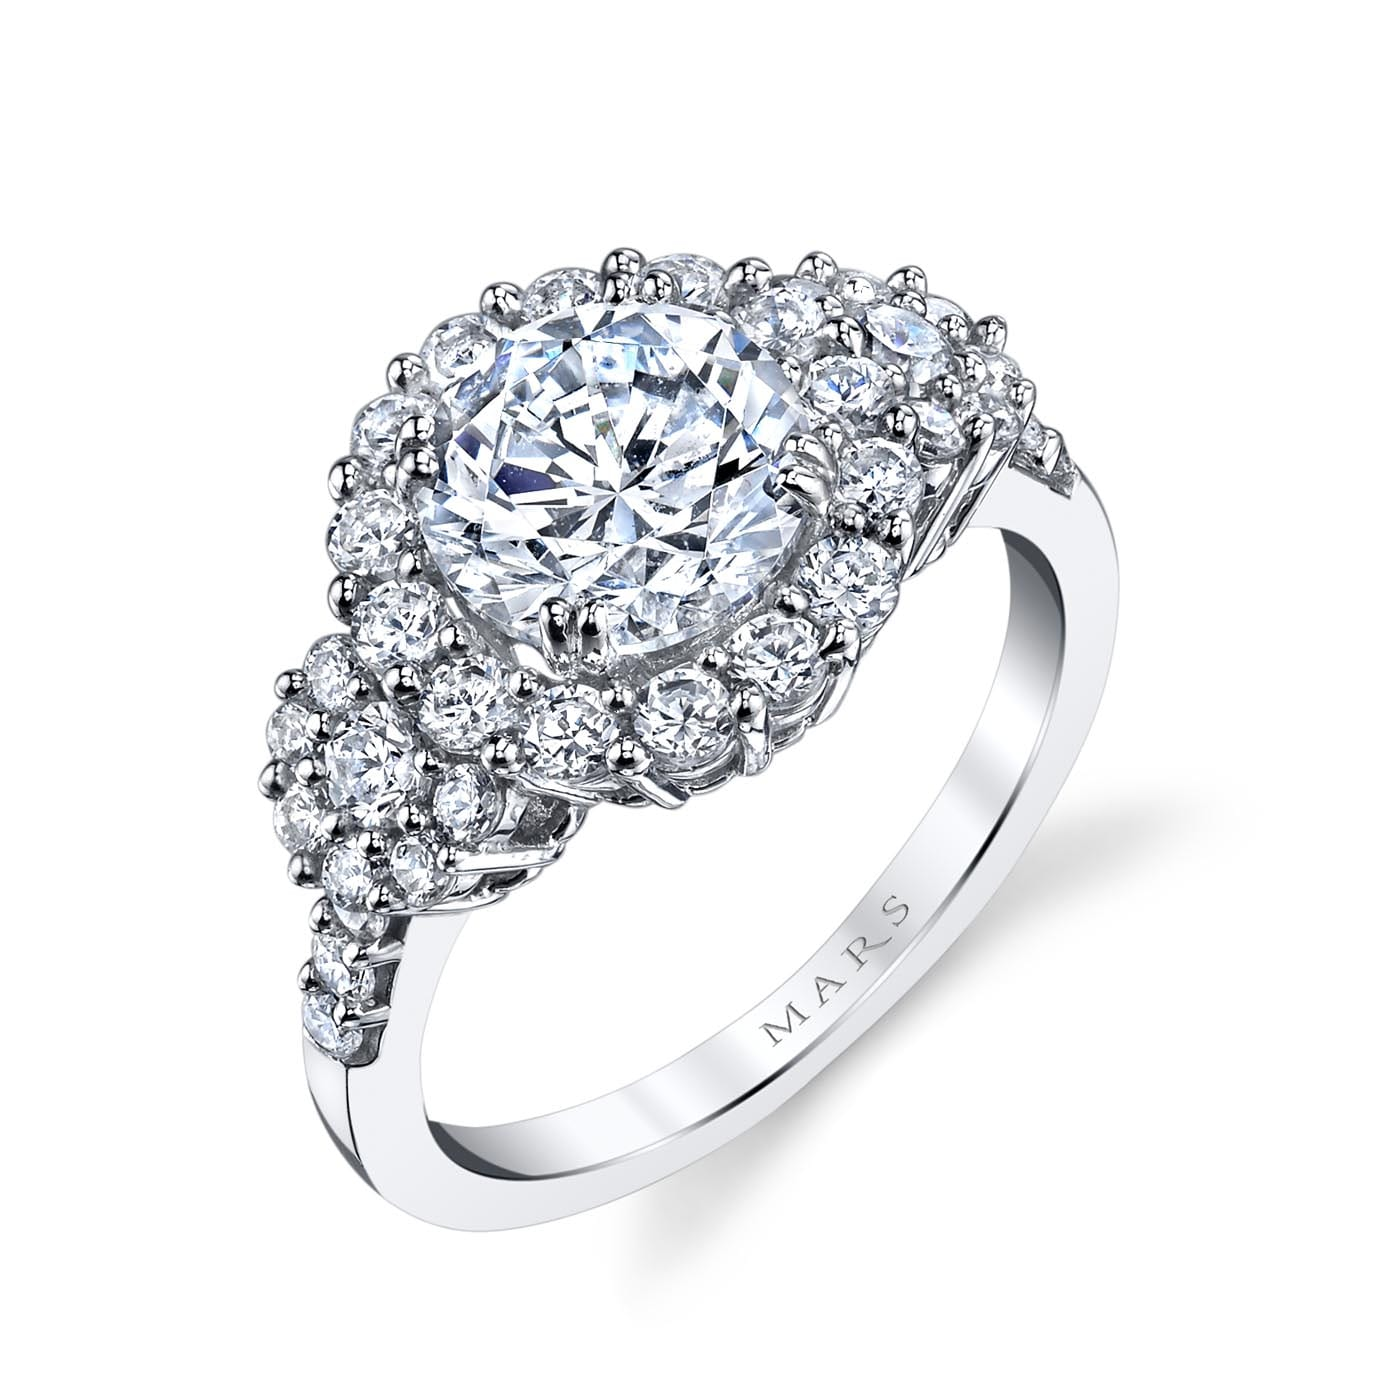 Halo Engagement RingStyle #: MARS 25606